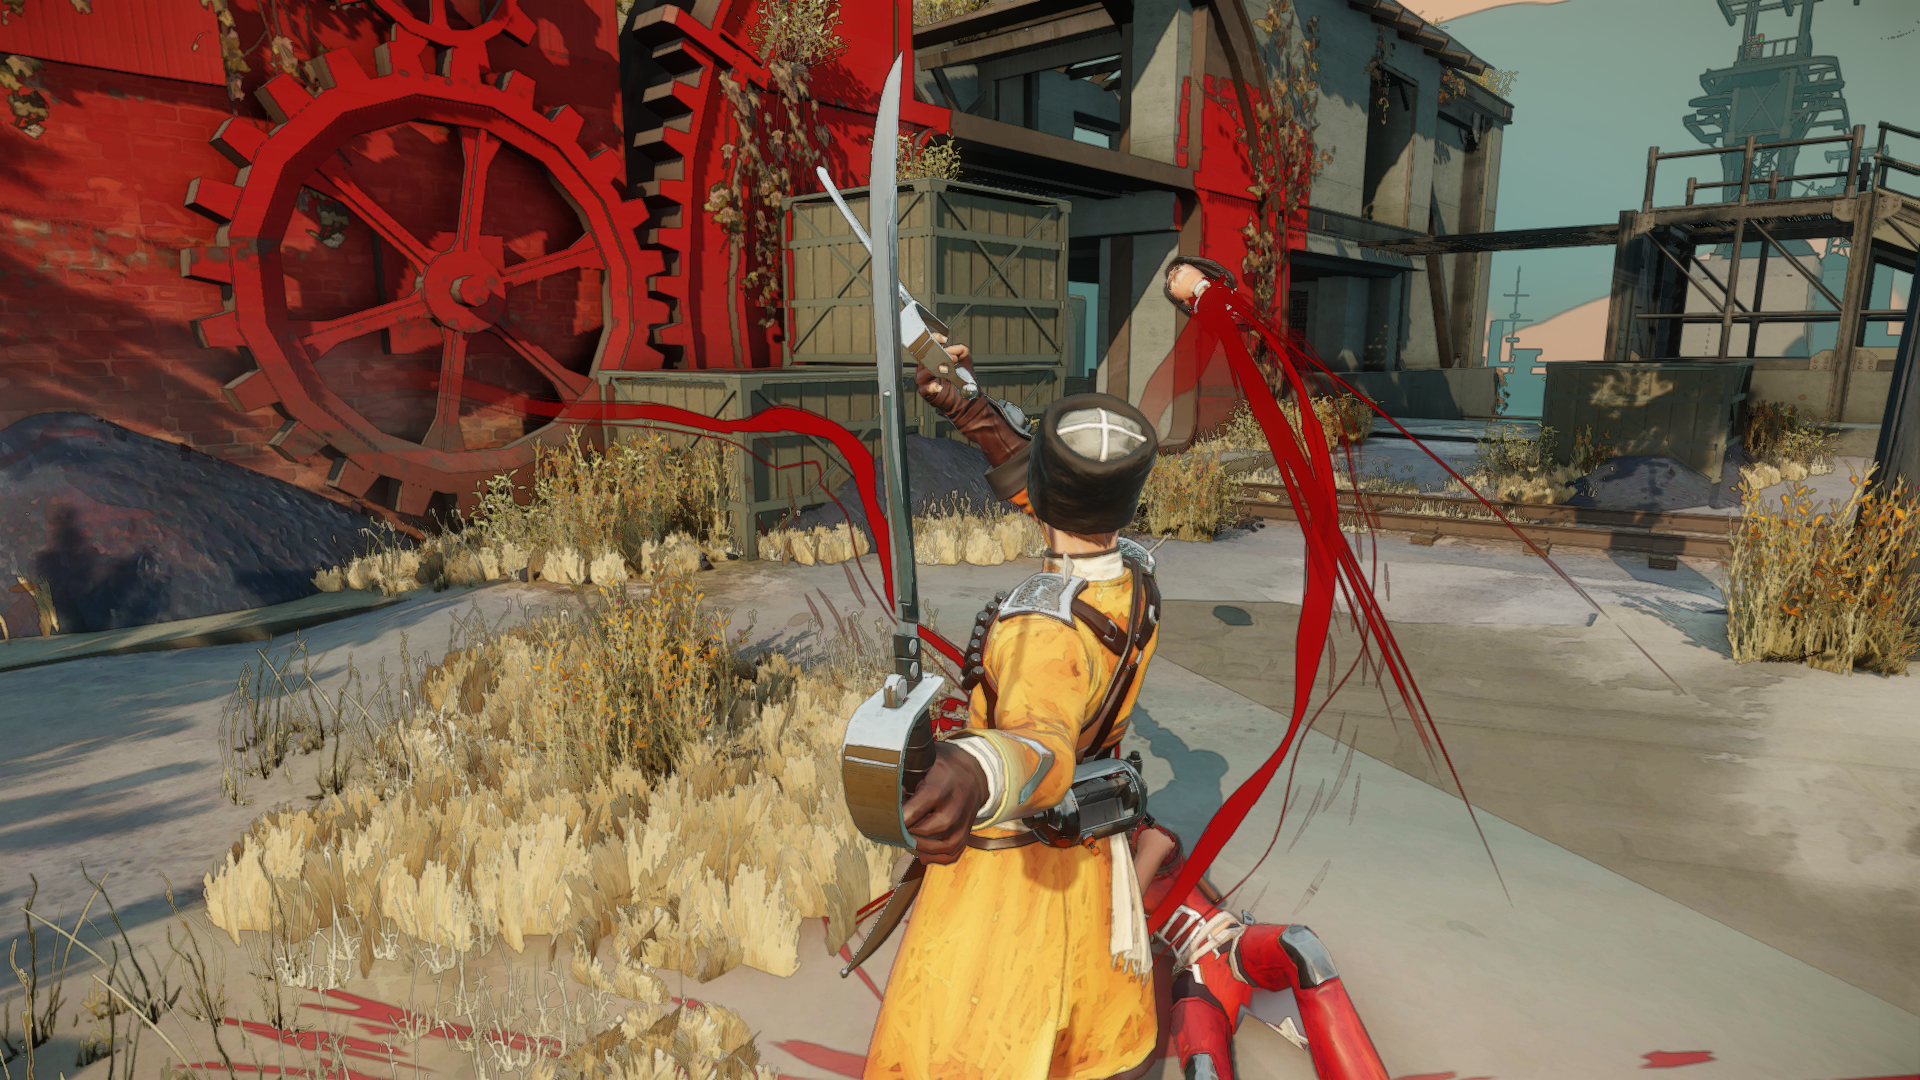 Battlecry combat